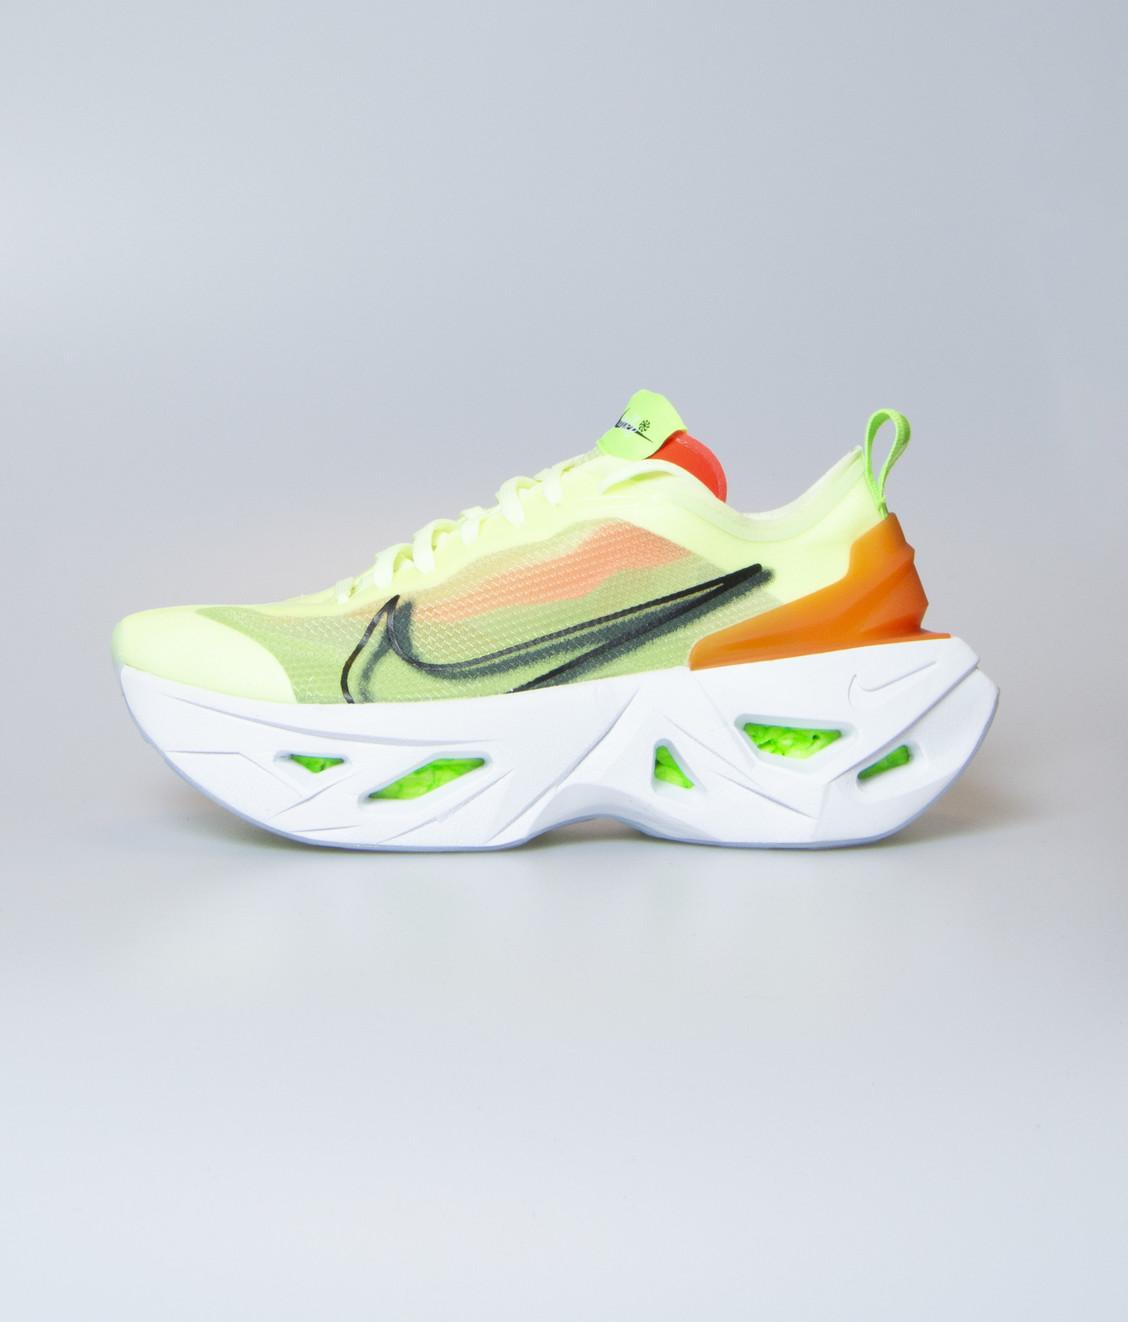 Nike Nike Sportswear Zoom X Vista Grind Volt